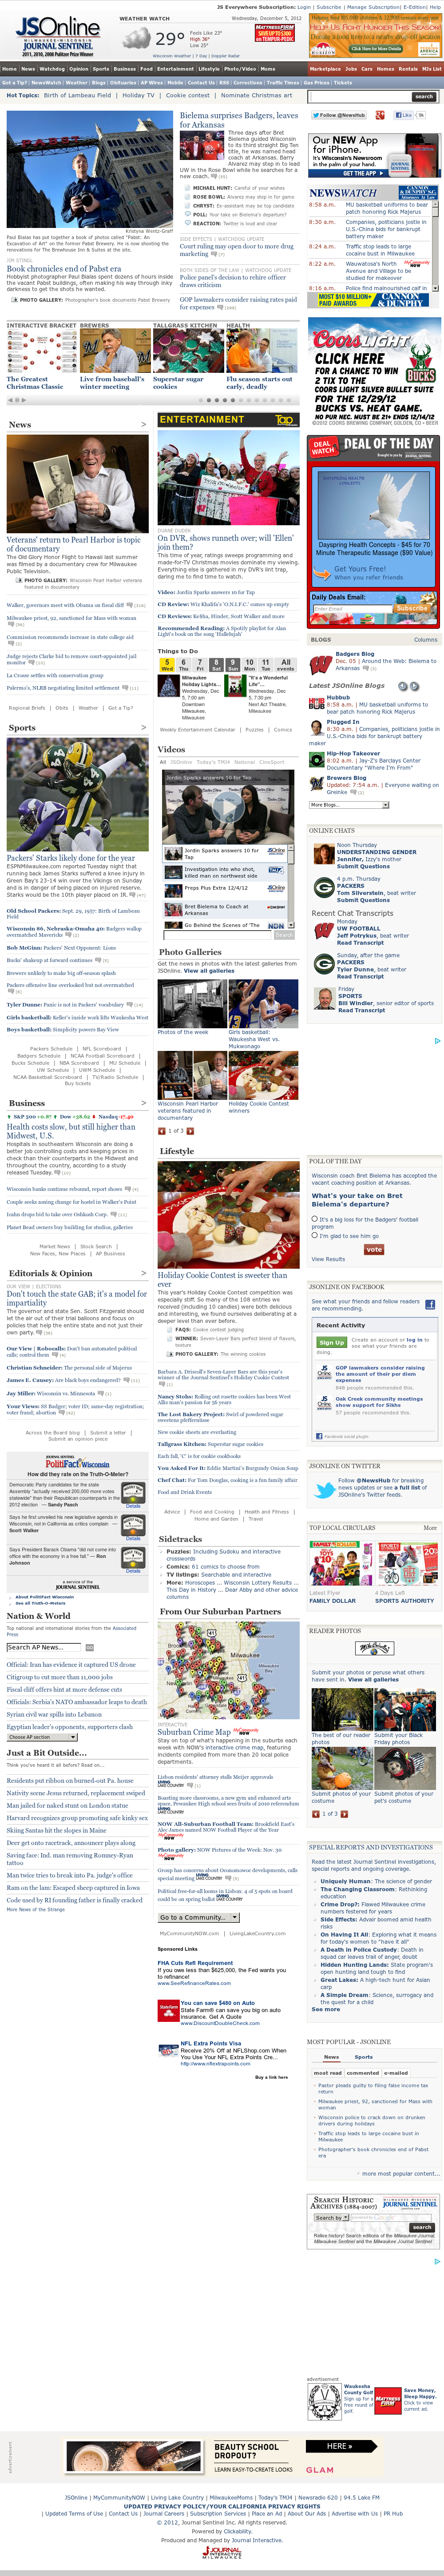 Milwaukee Journal Sentinel at Wednesday Dec. 5, 2012, 3:28 p.m. UTC